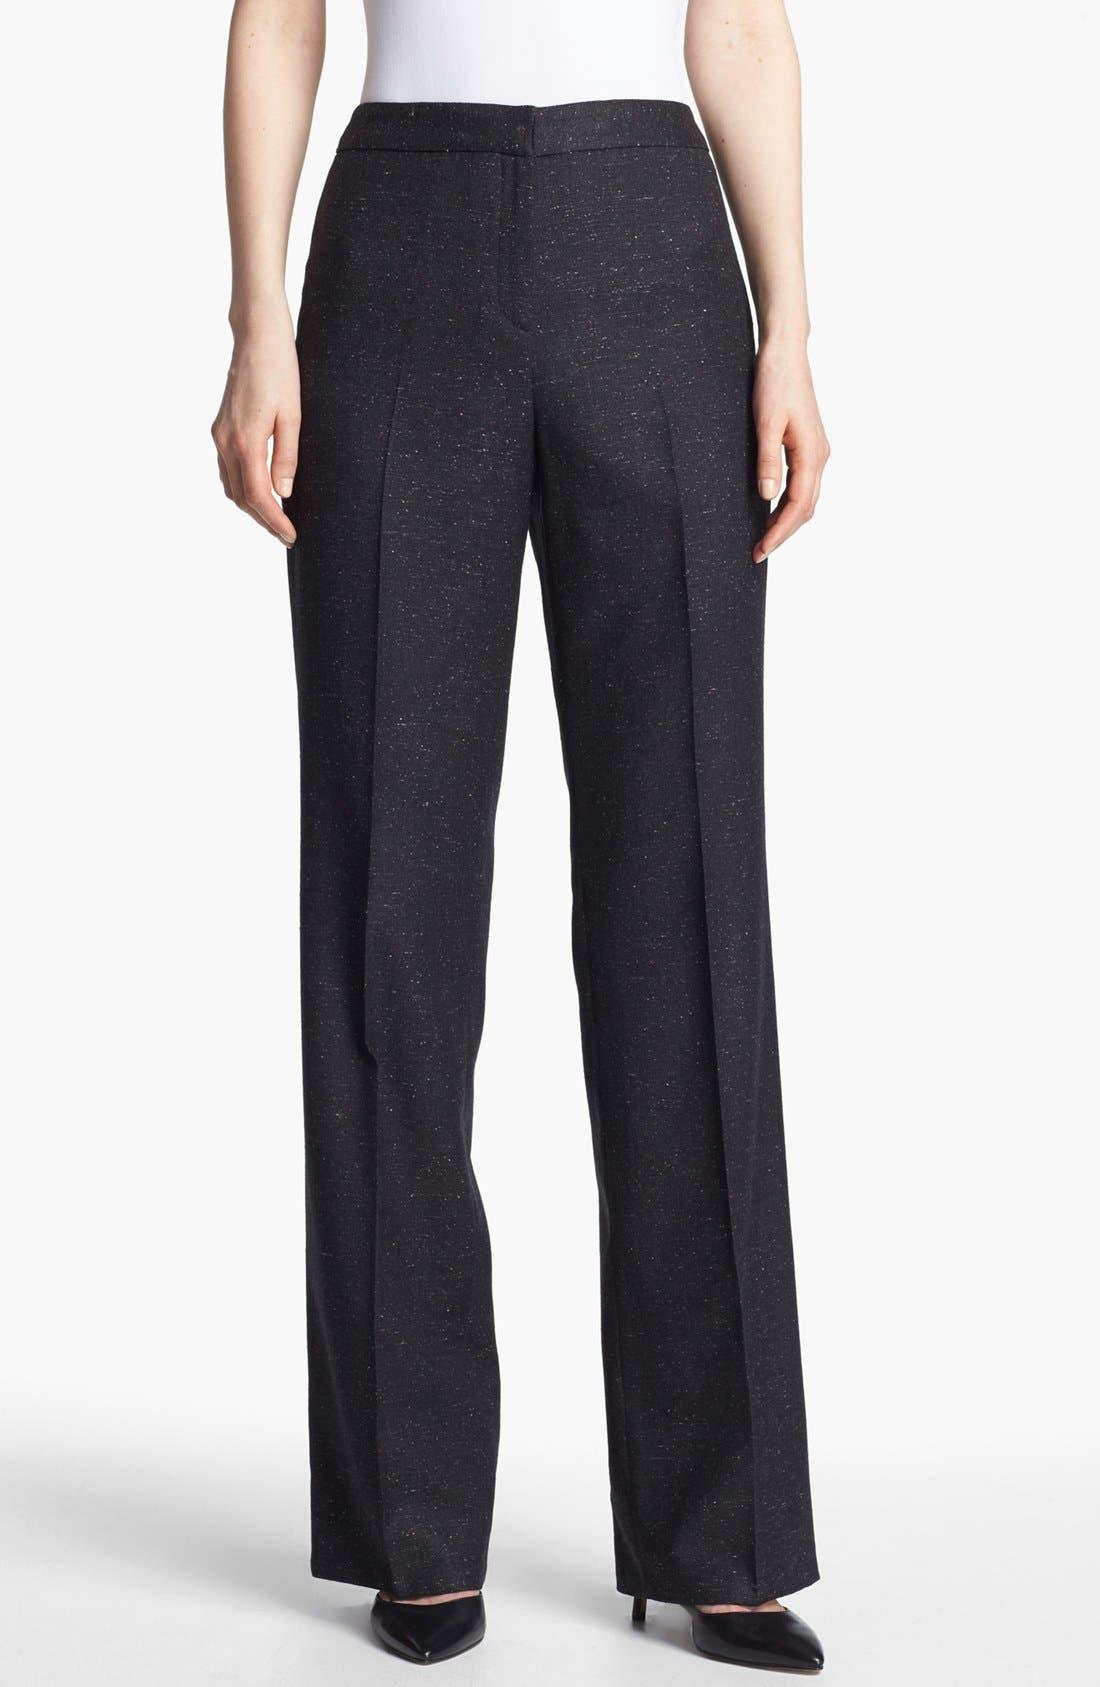 Alternate Image 1 Selected - Santorelli 'Mara' Tweed Trousers